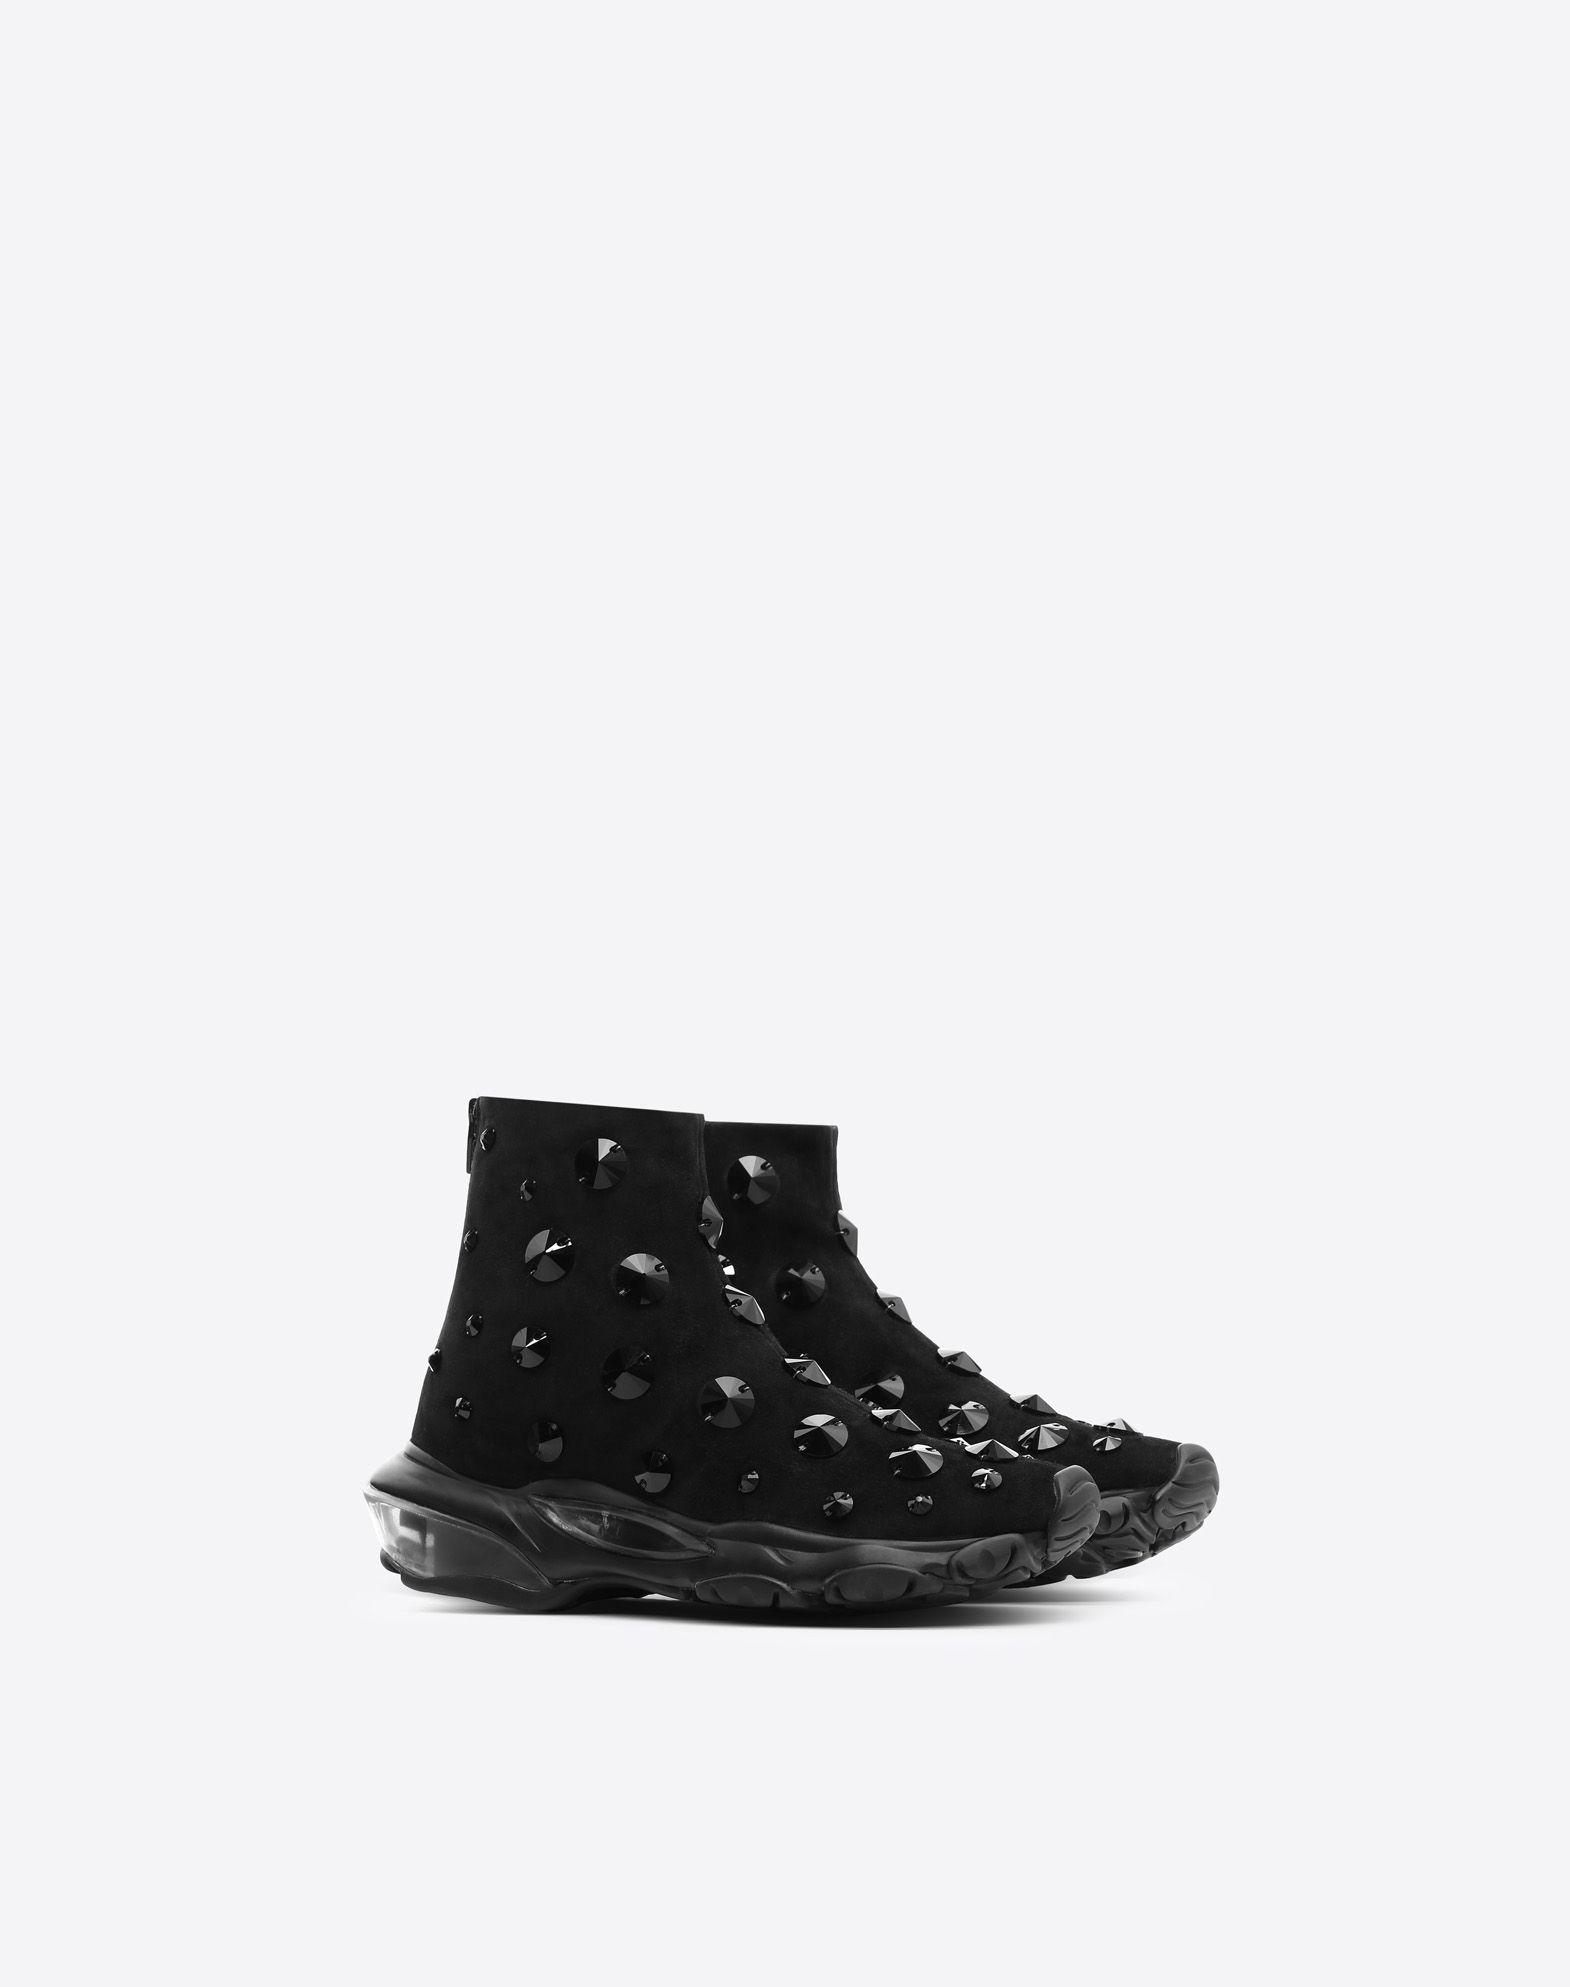 VALENTINO GARAVANI Bounce Sneaker HIGH-TOP SNEAKER D r